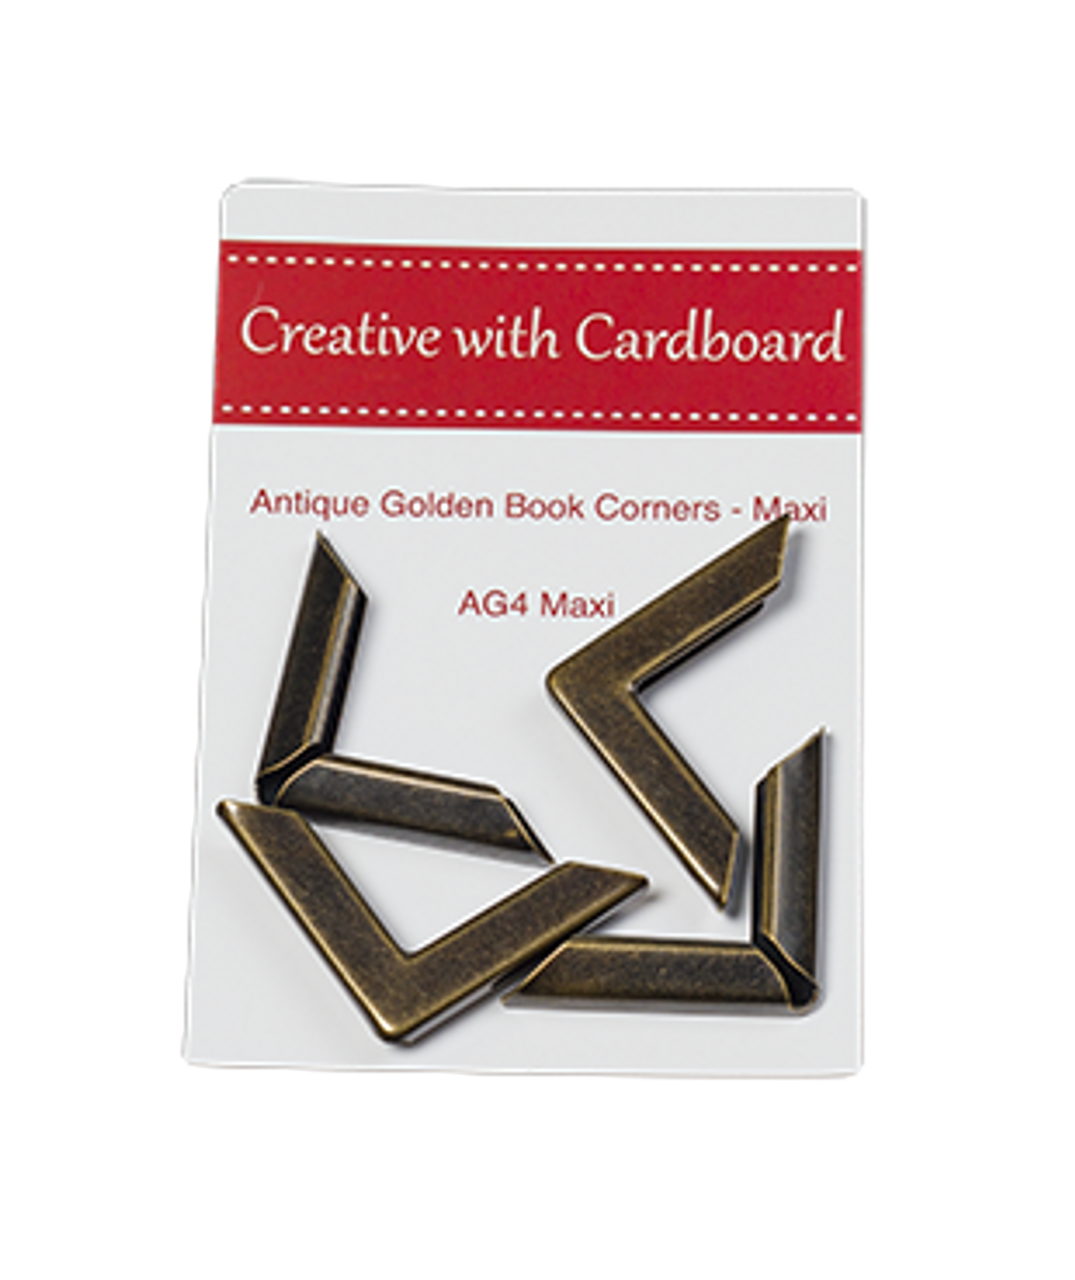 Rinske Stevens Designs: Antique Golden Book Corners Maxi